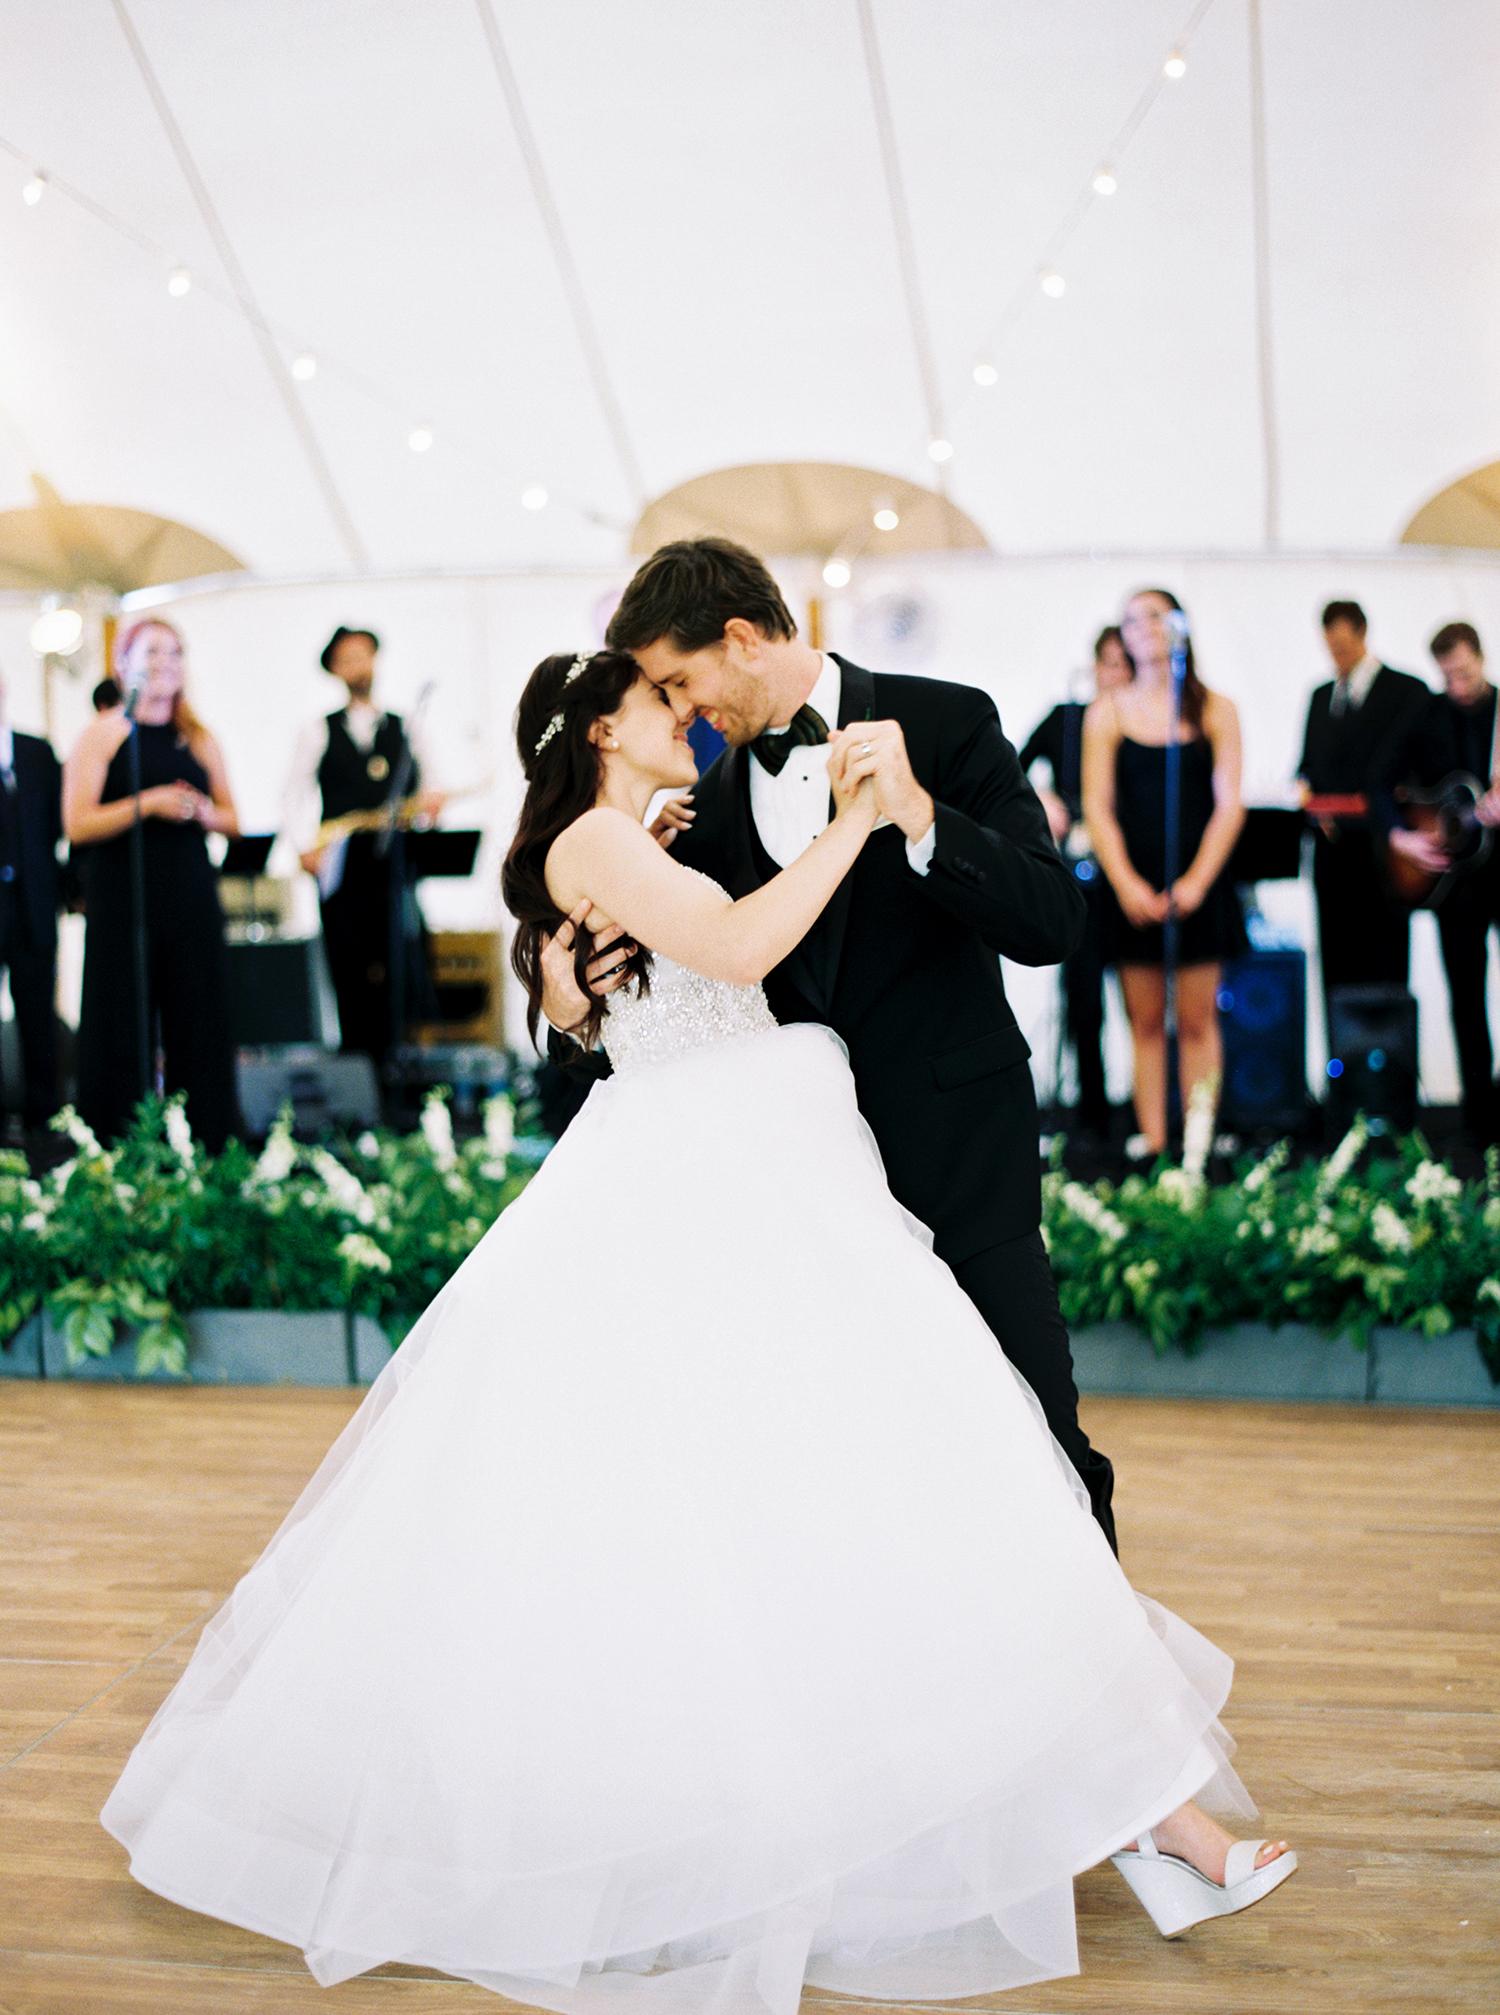 dani jackson wedding first dance